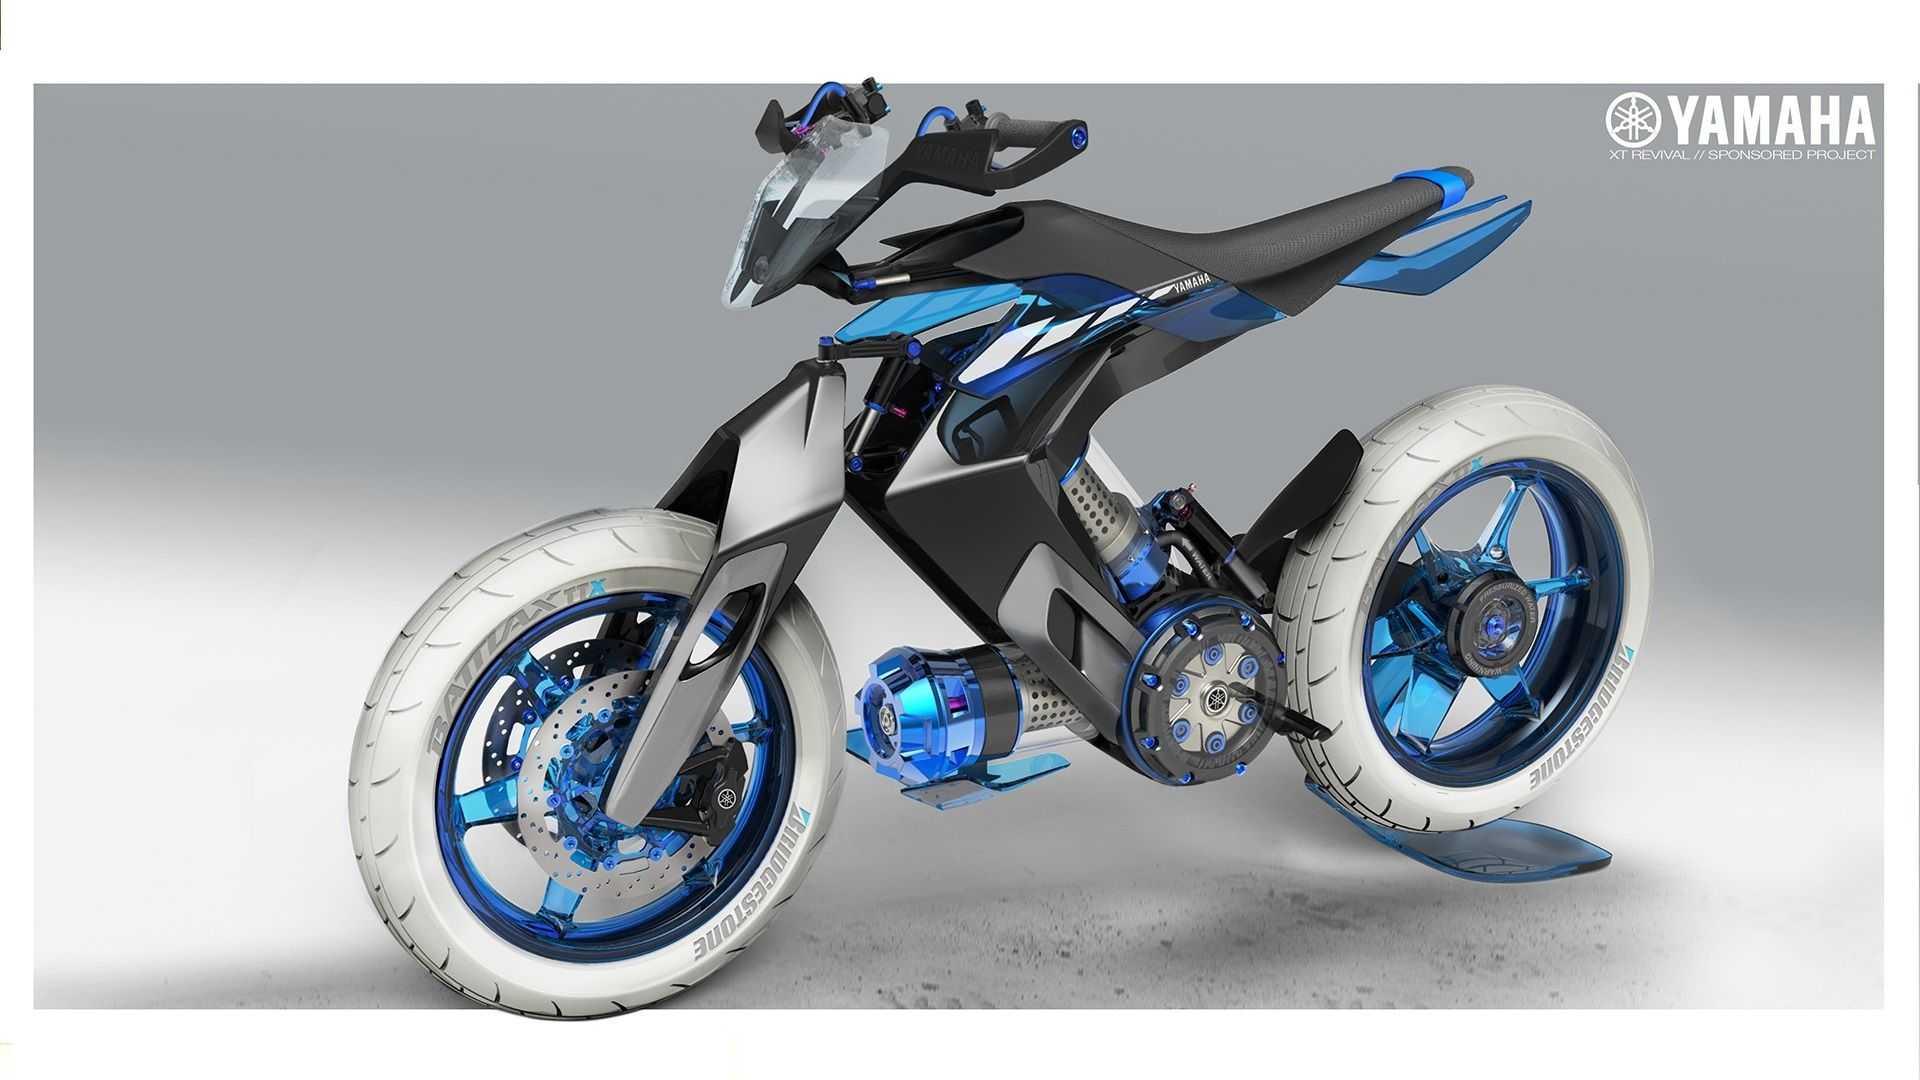 yamaha xt 500 h2o concept